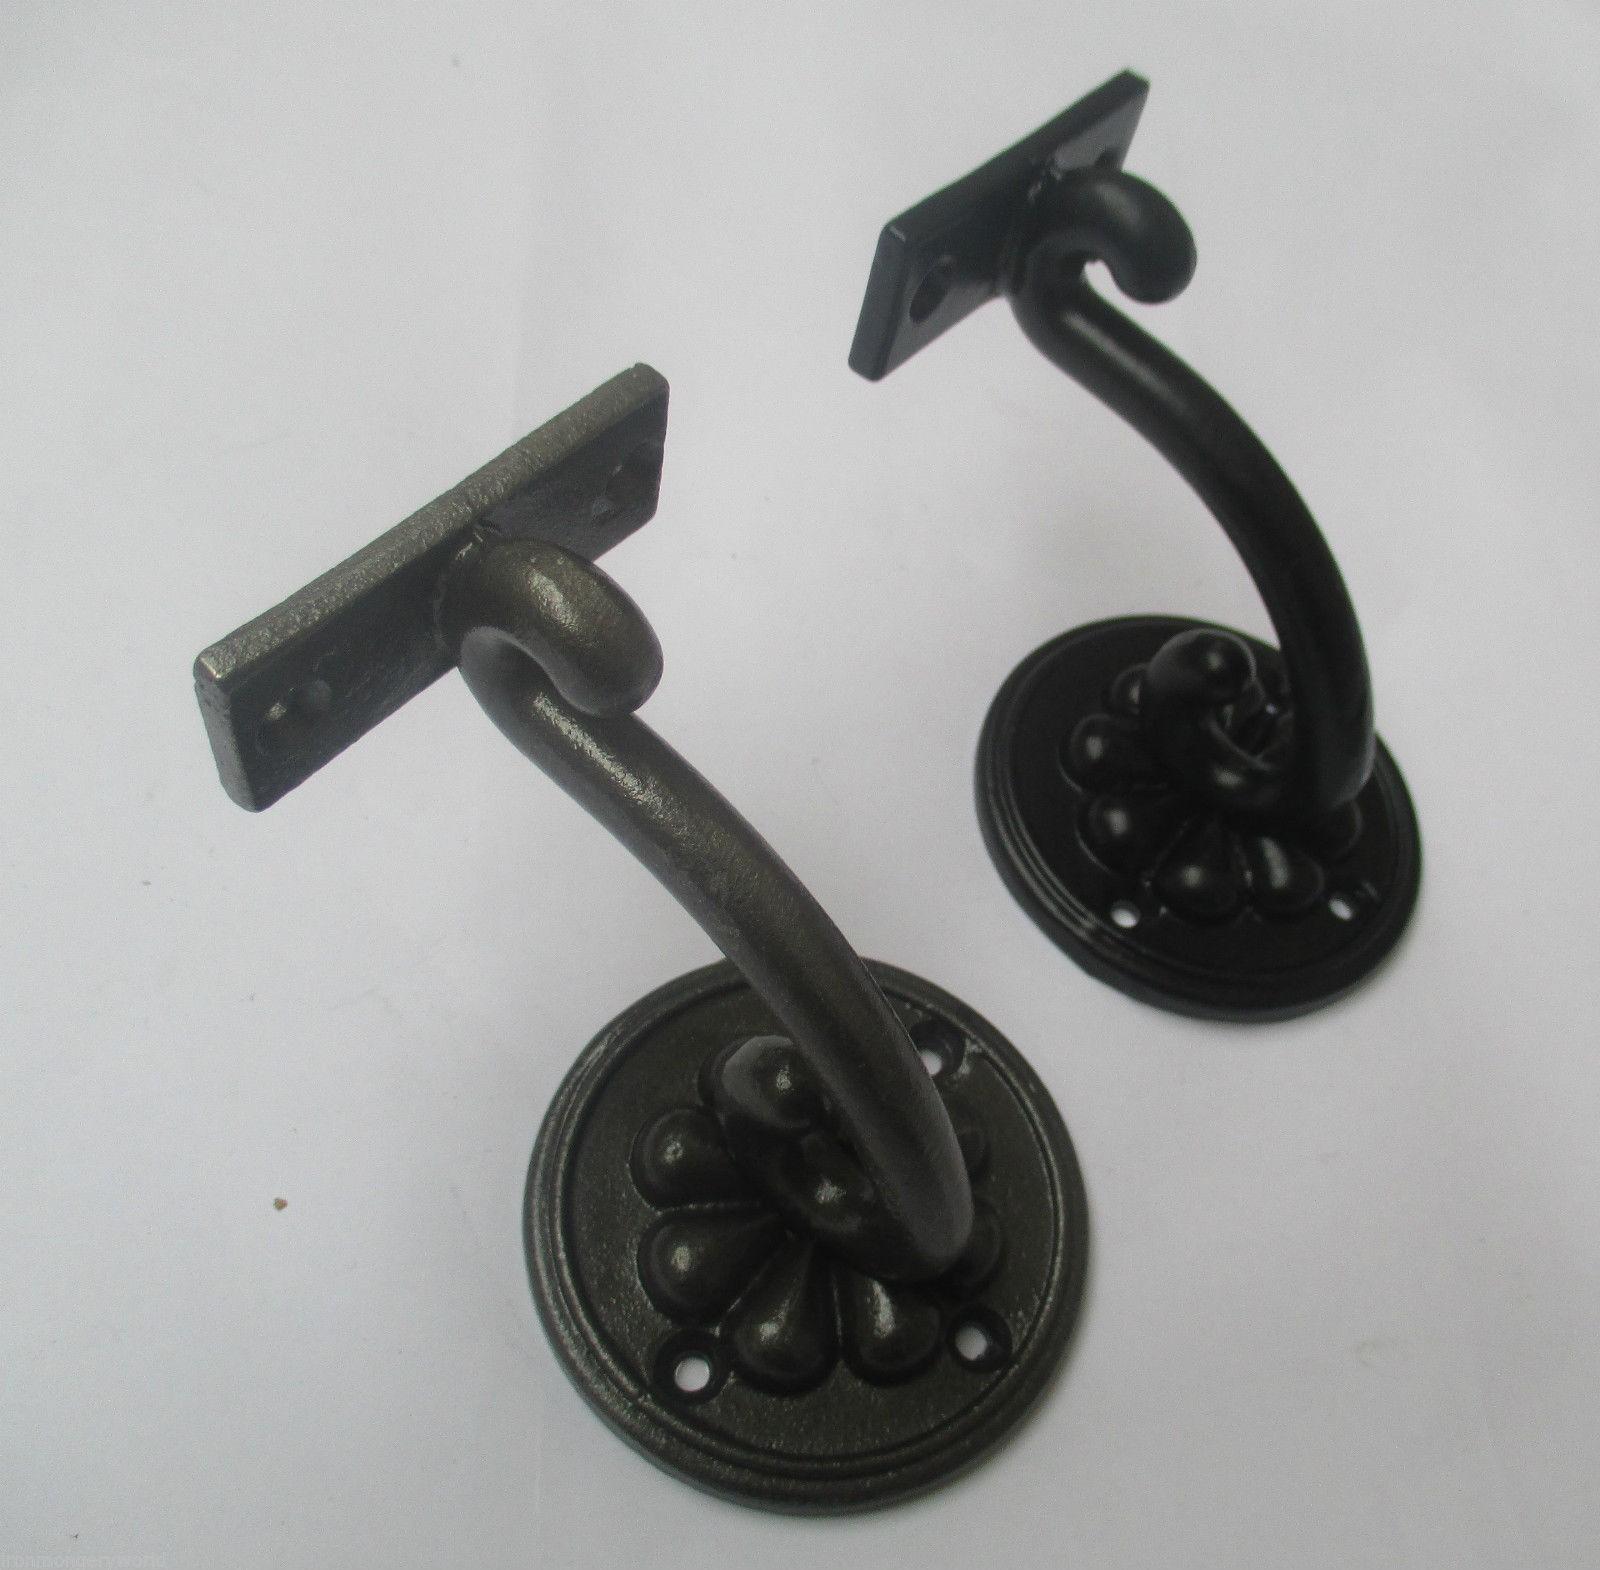 1 X CAST IRON ORNATE FANCY HAND RAIL STAIR BRACKET